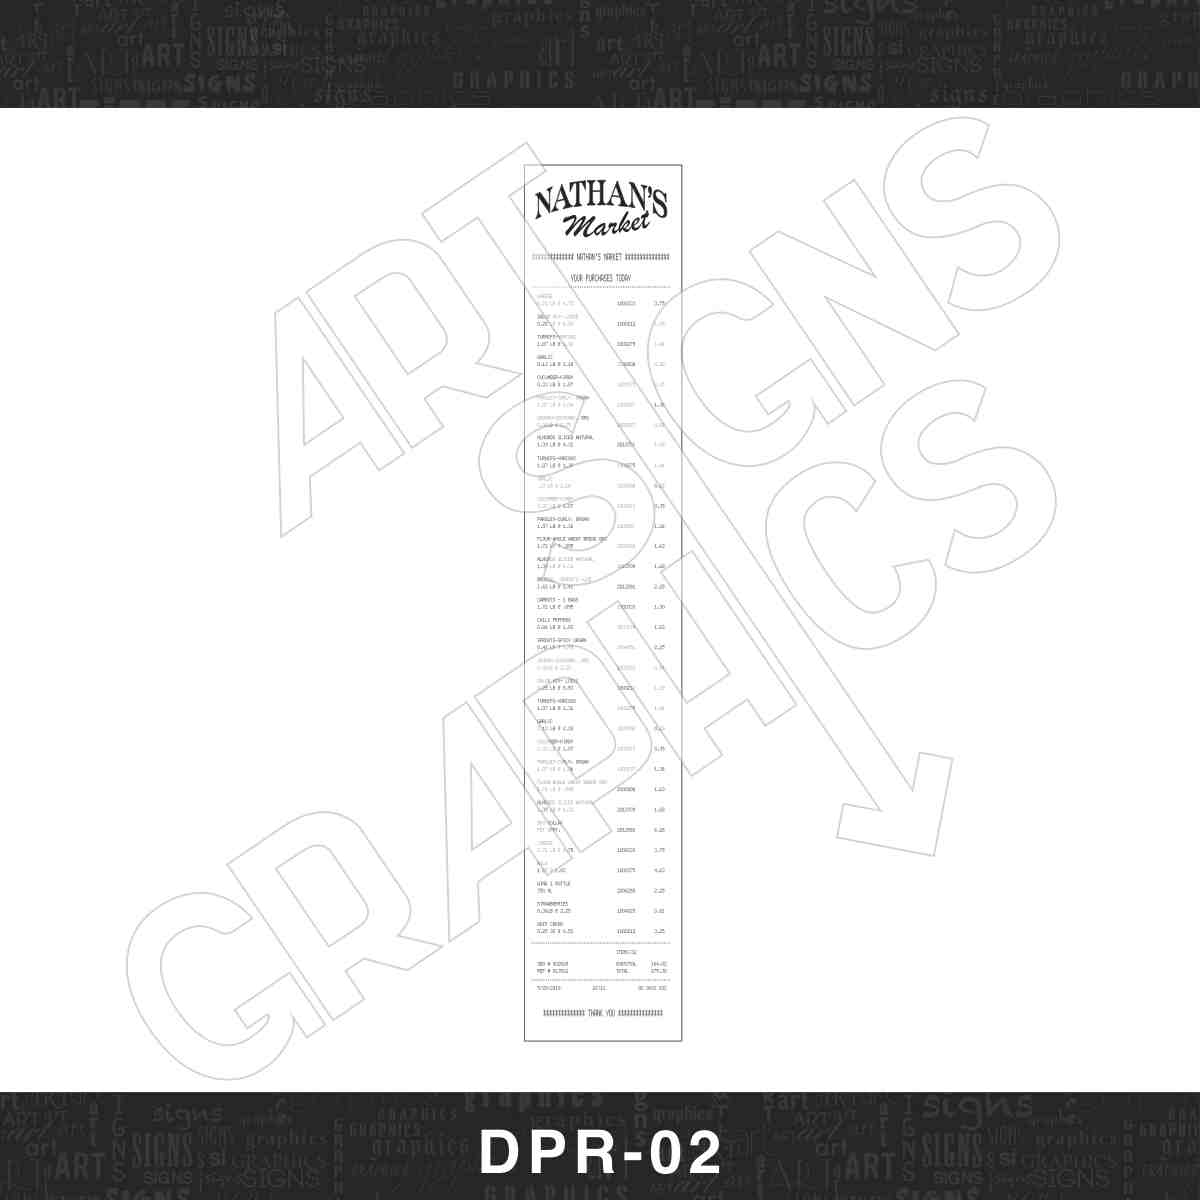 DPR-02.jpg